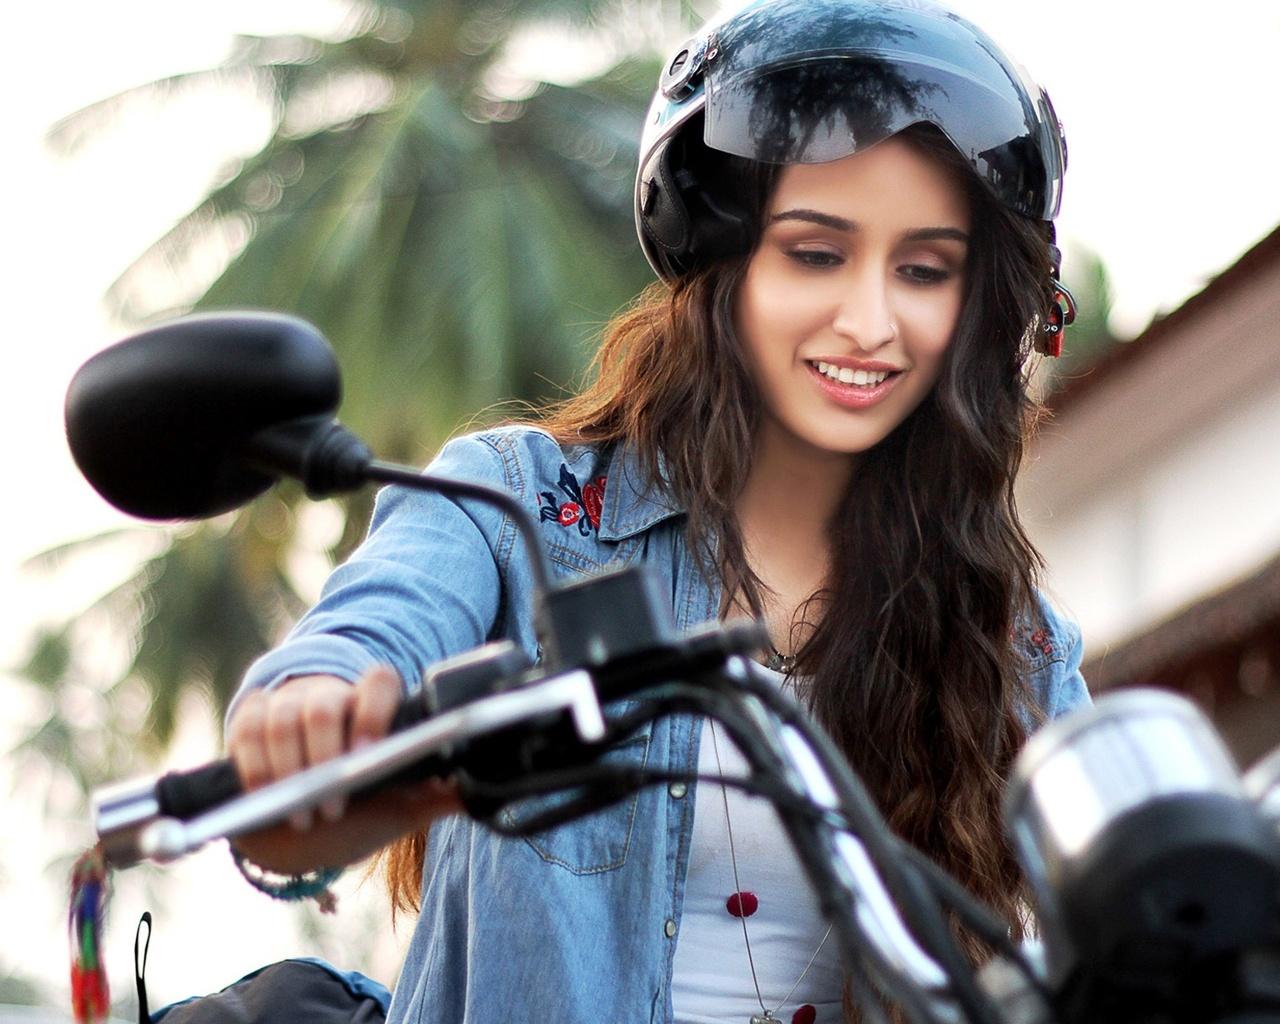 1280x1024 Shraddha Kapoor Very Cute 1280x1024 Resolution Hd 4k